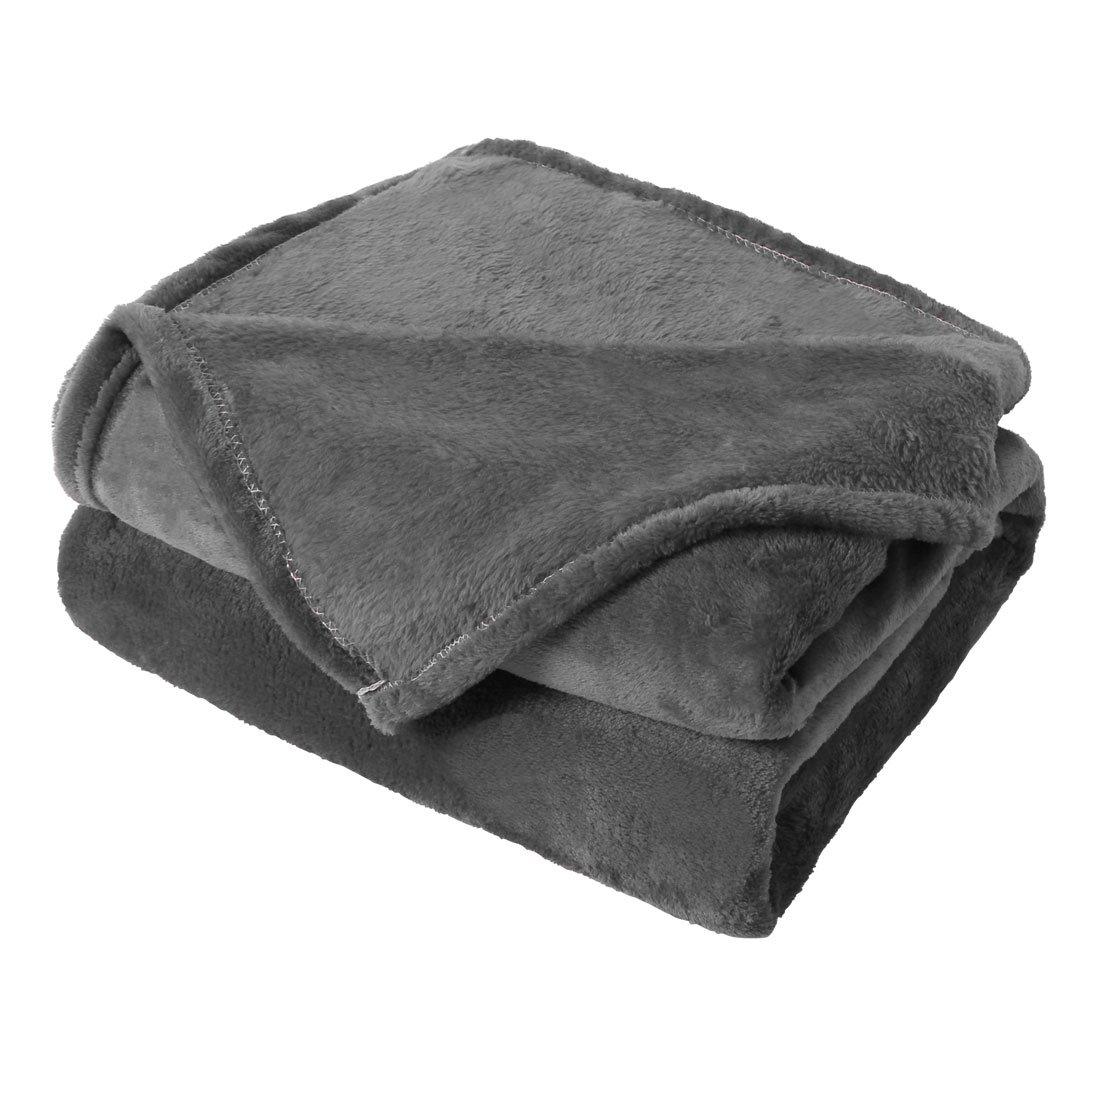 uxcell Flannel Fleece Blanket Microfiber Lightweight Soft Plush Solid Queen Blankets Dark Gray 90 x 90 Inch